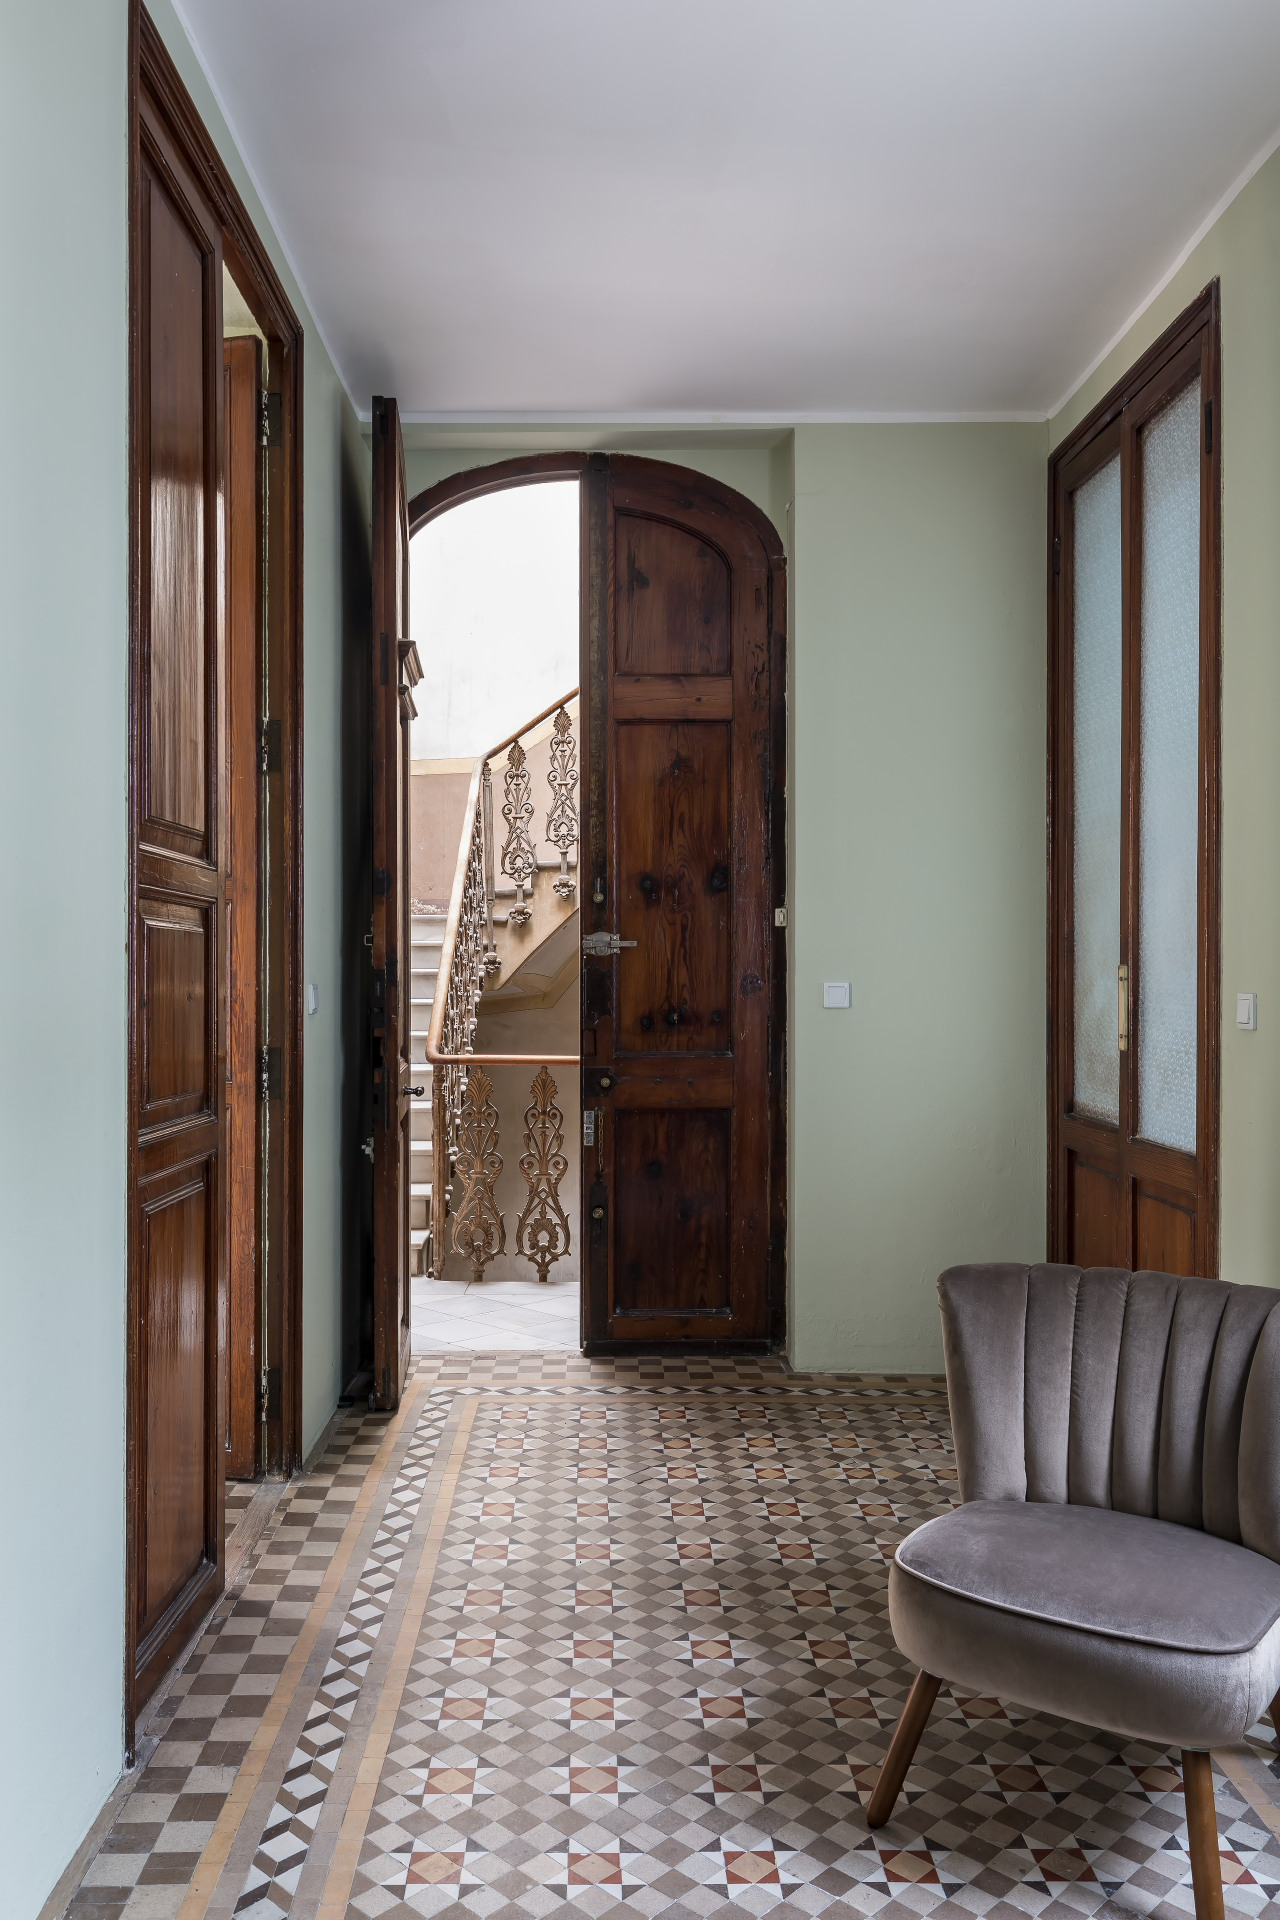 fotografia-arquitectura-interiorismo-valencia-german-cabo-lliberos-naquera-aya (1)